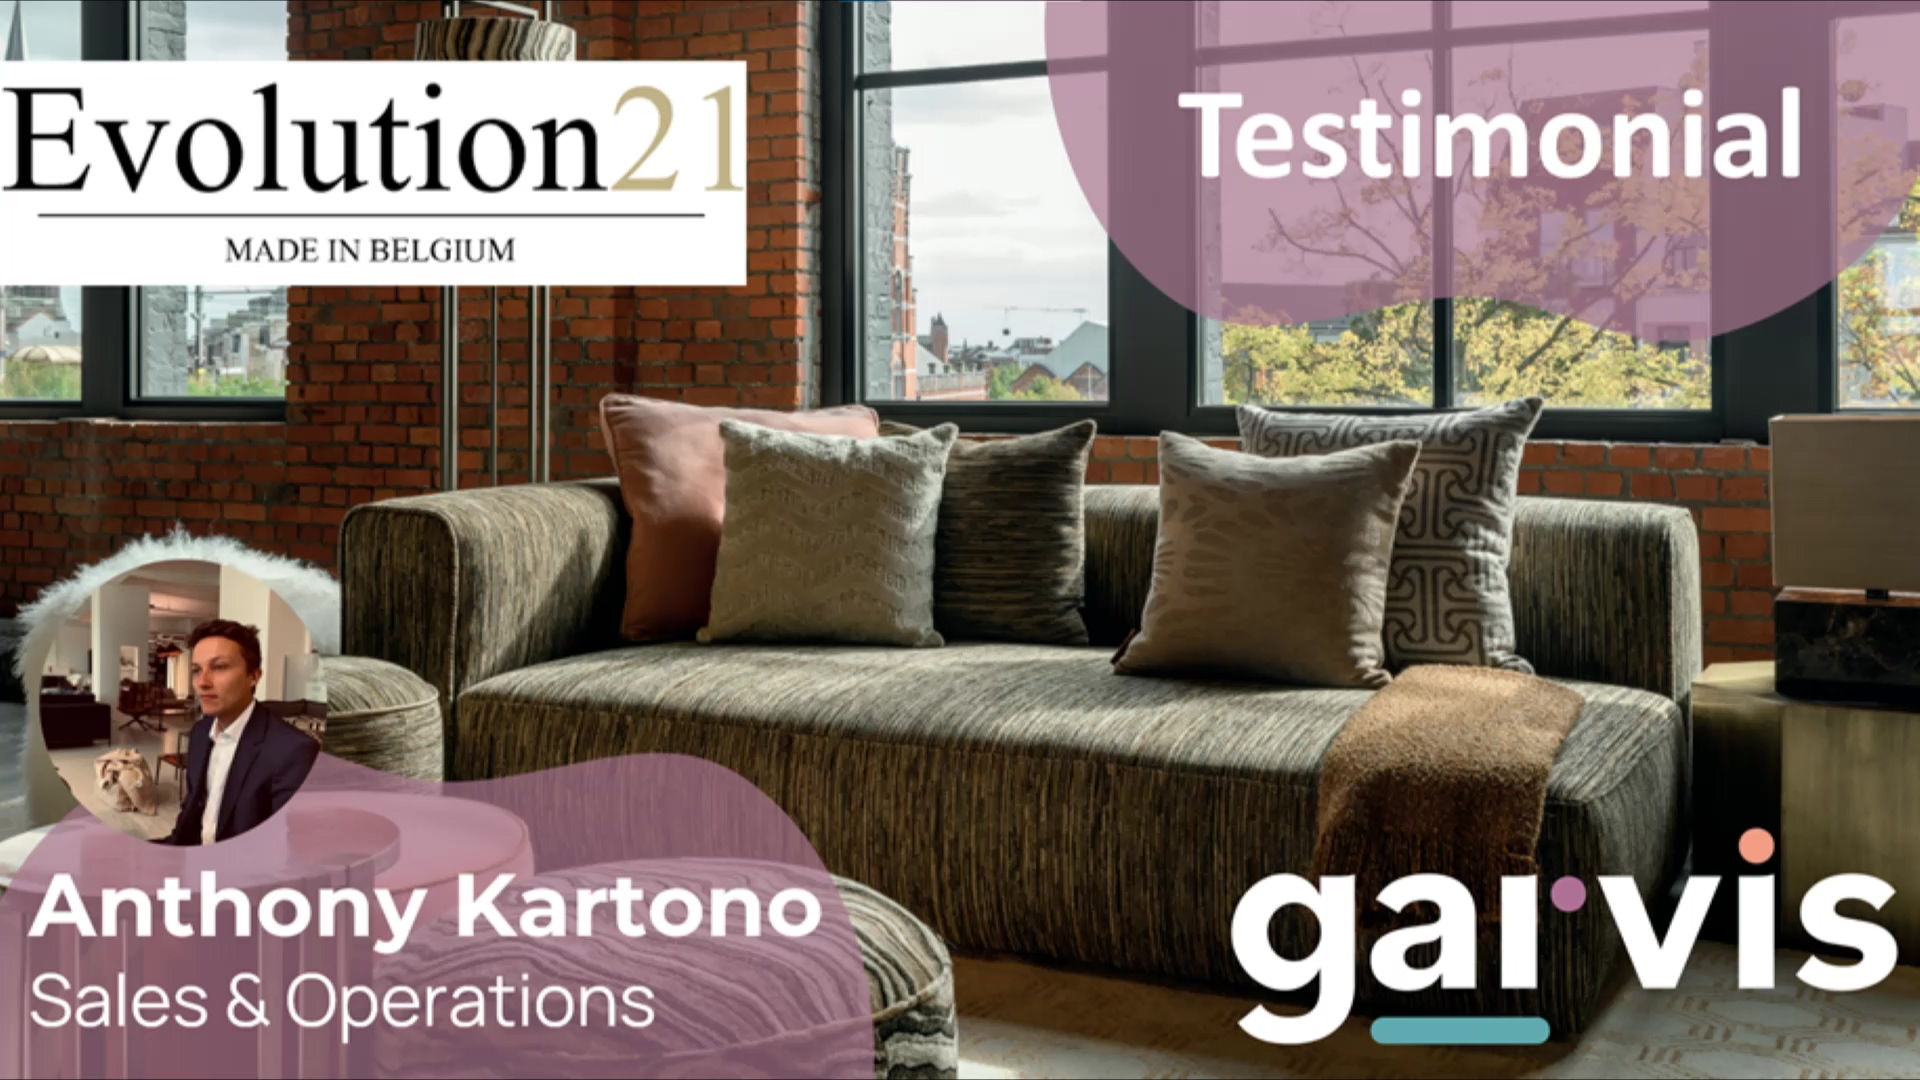 Testimonial - Evo21 - Anthony Kartono